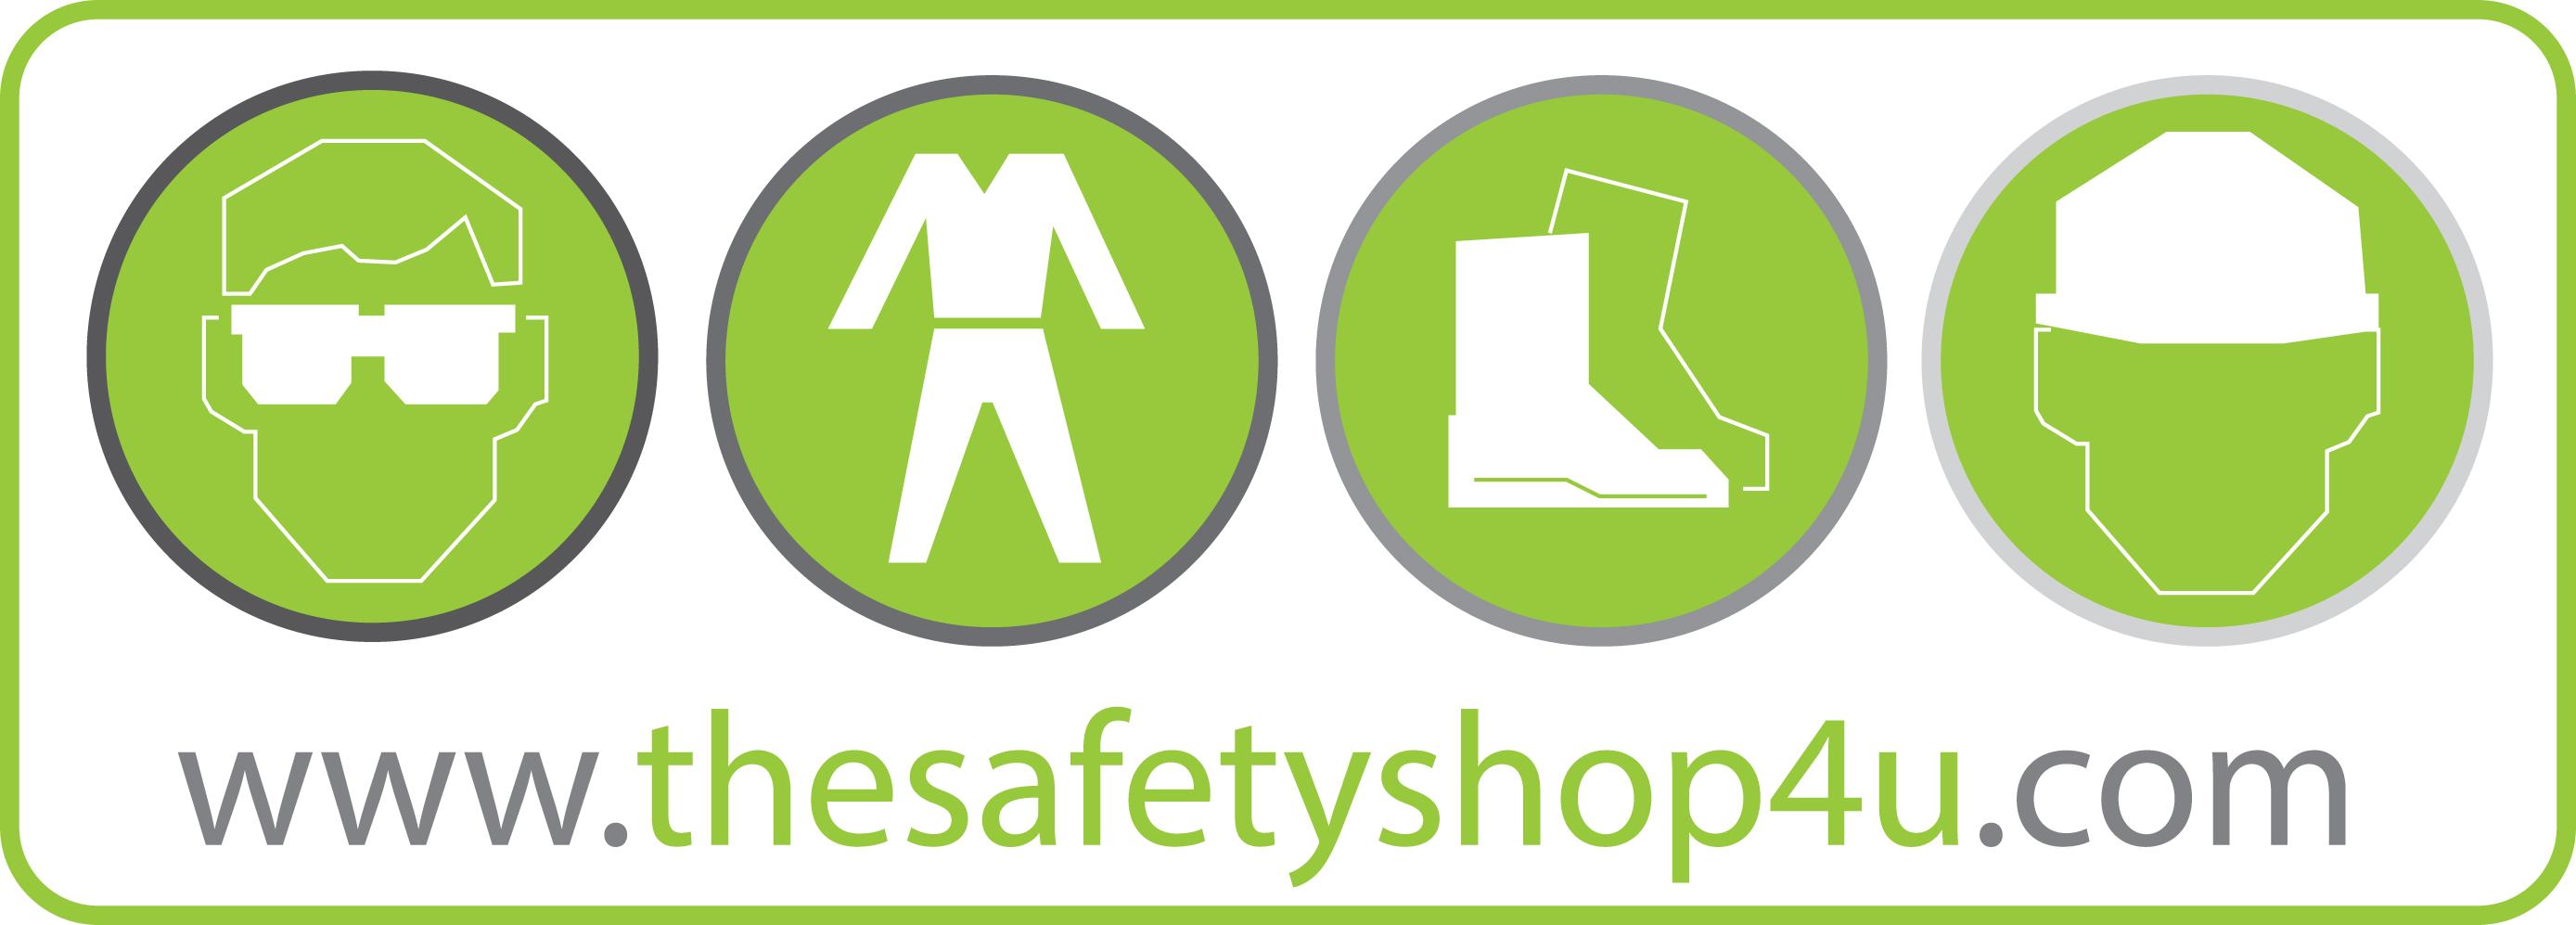 Safety logo (green)